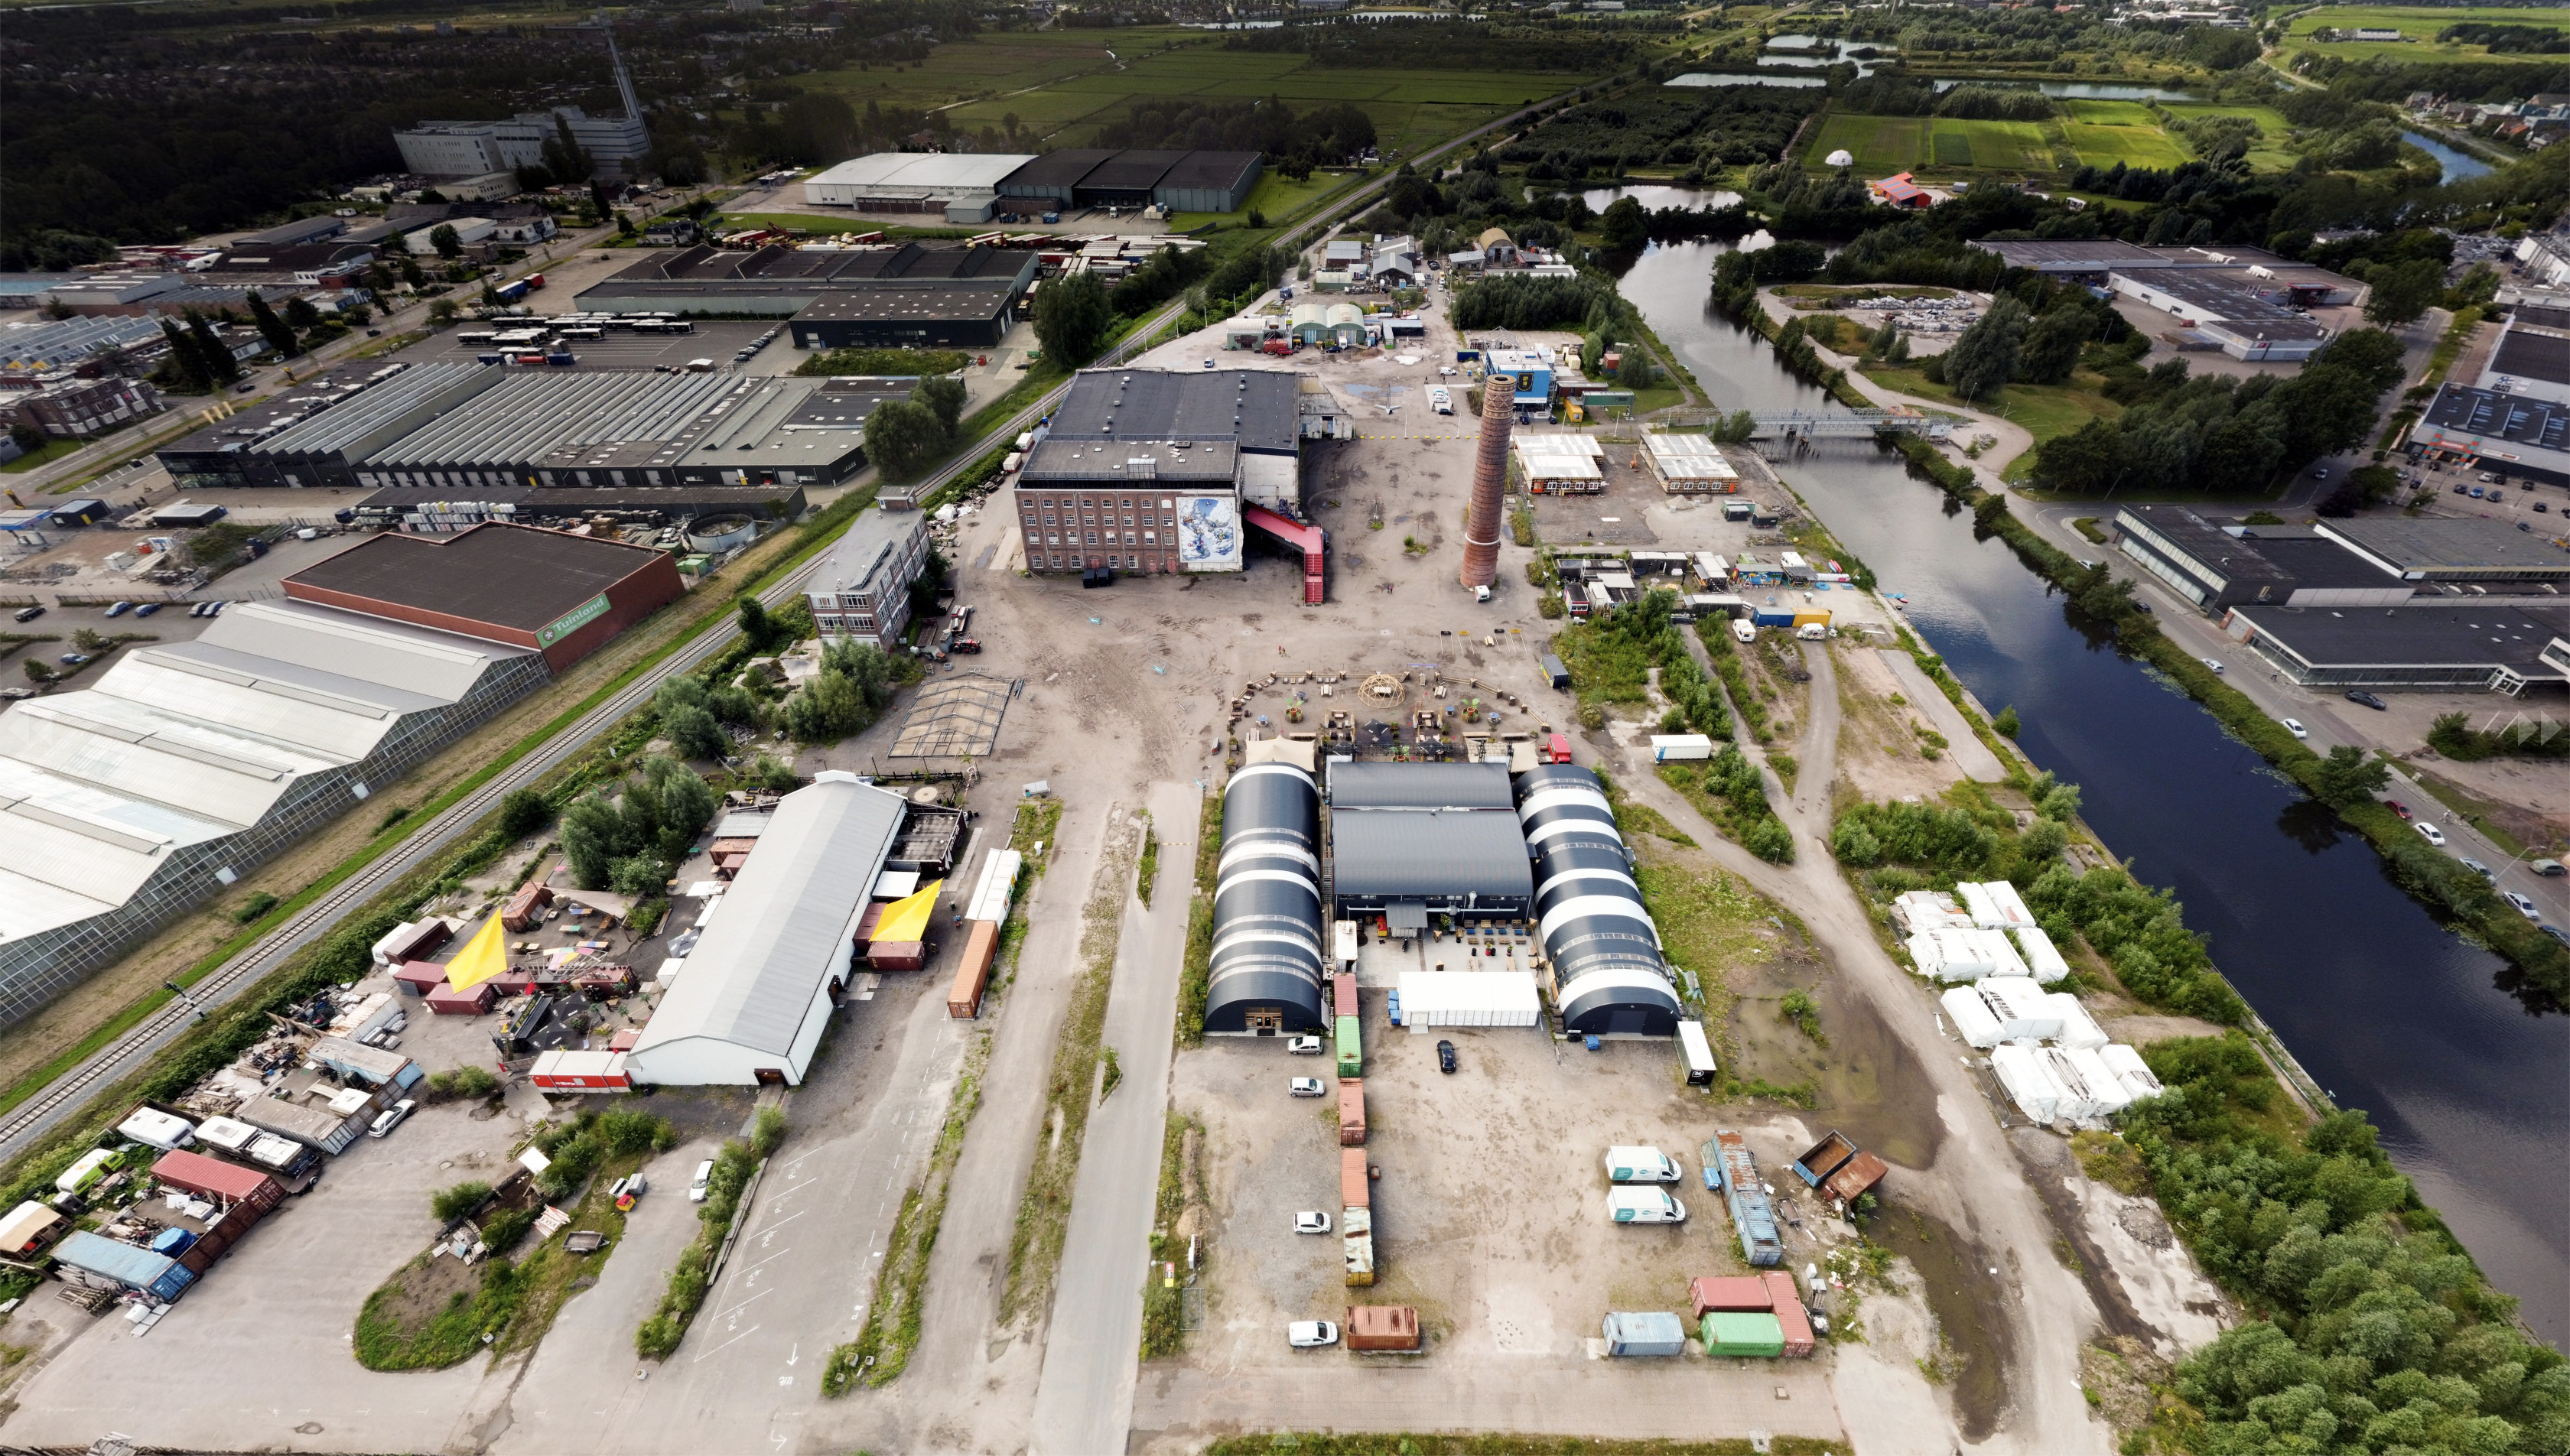 Drone foto oude Suikerunie terrein